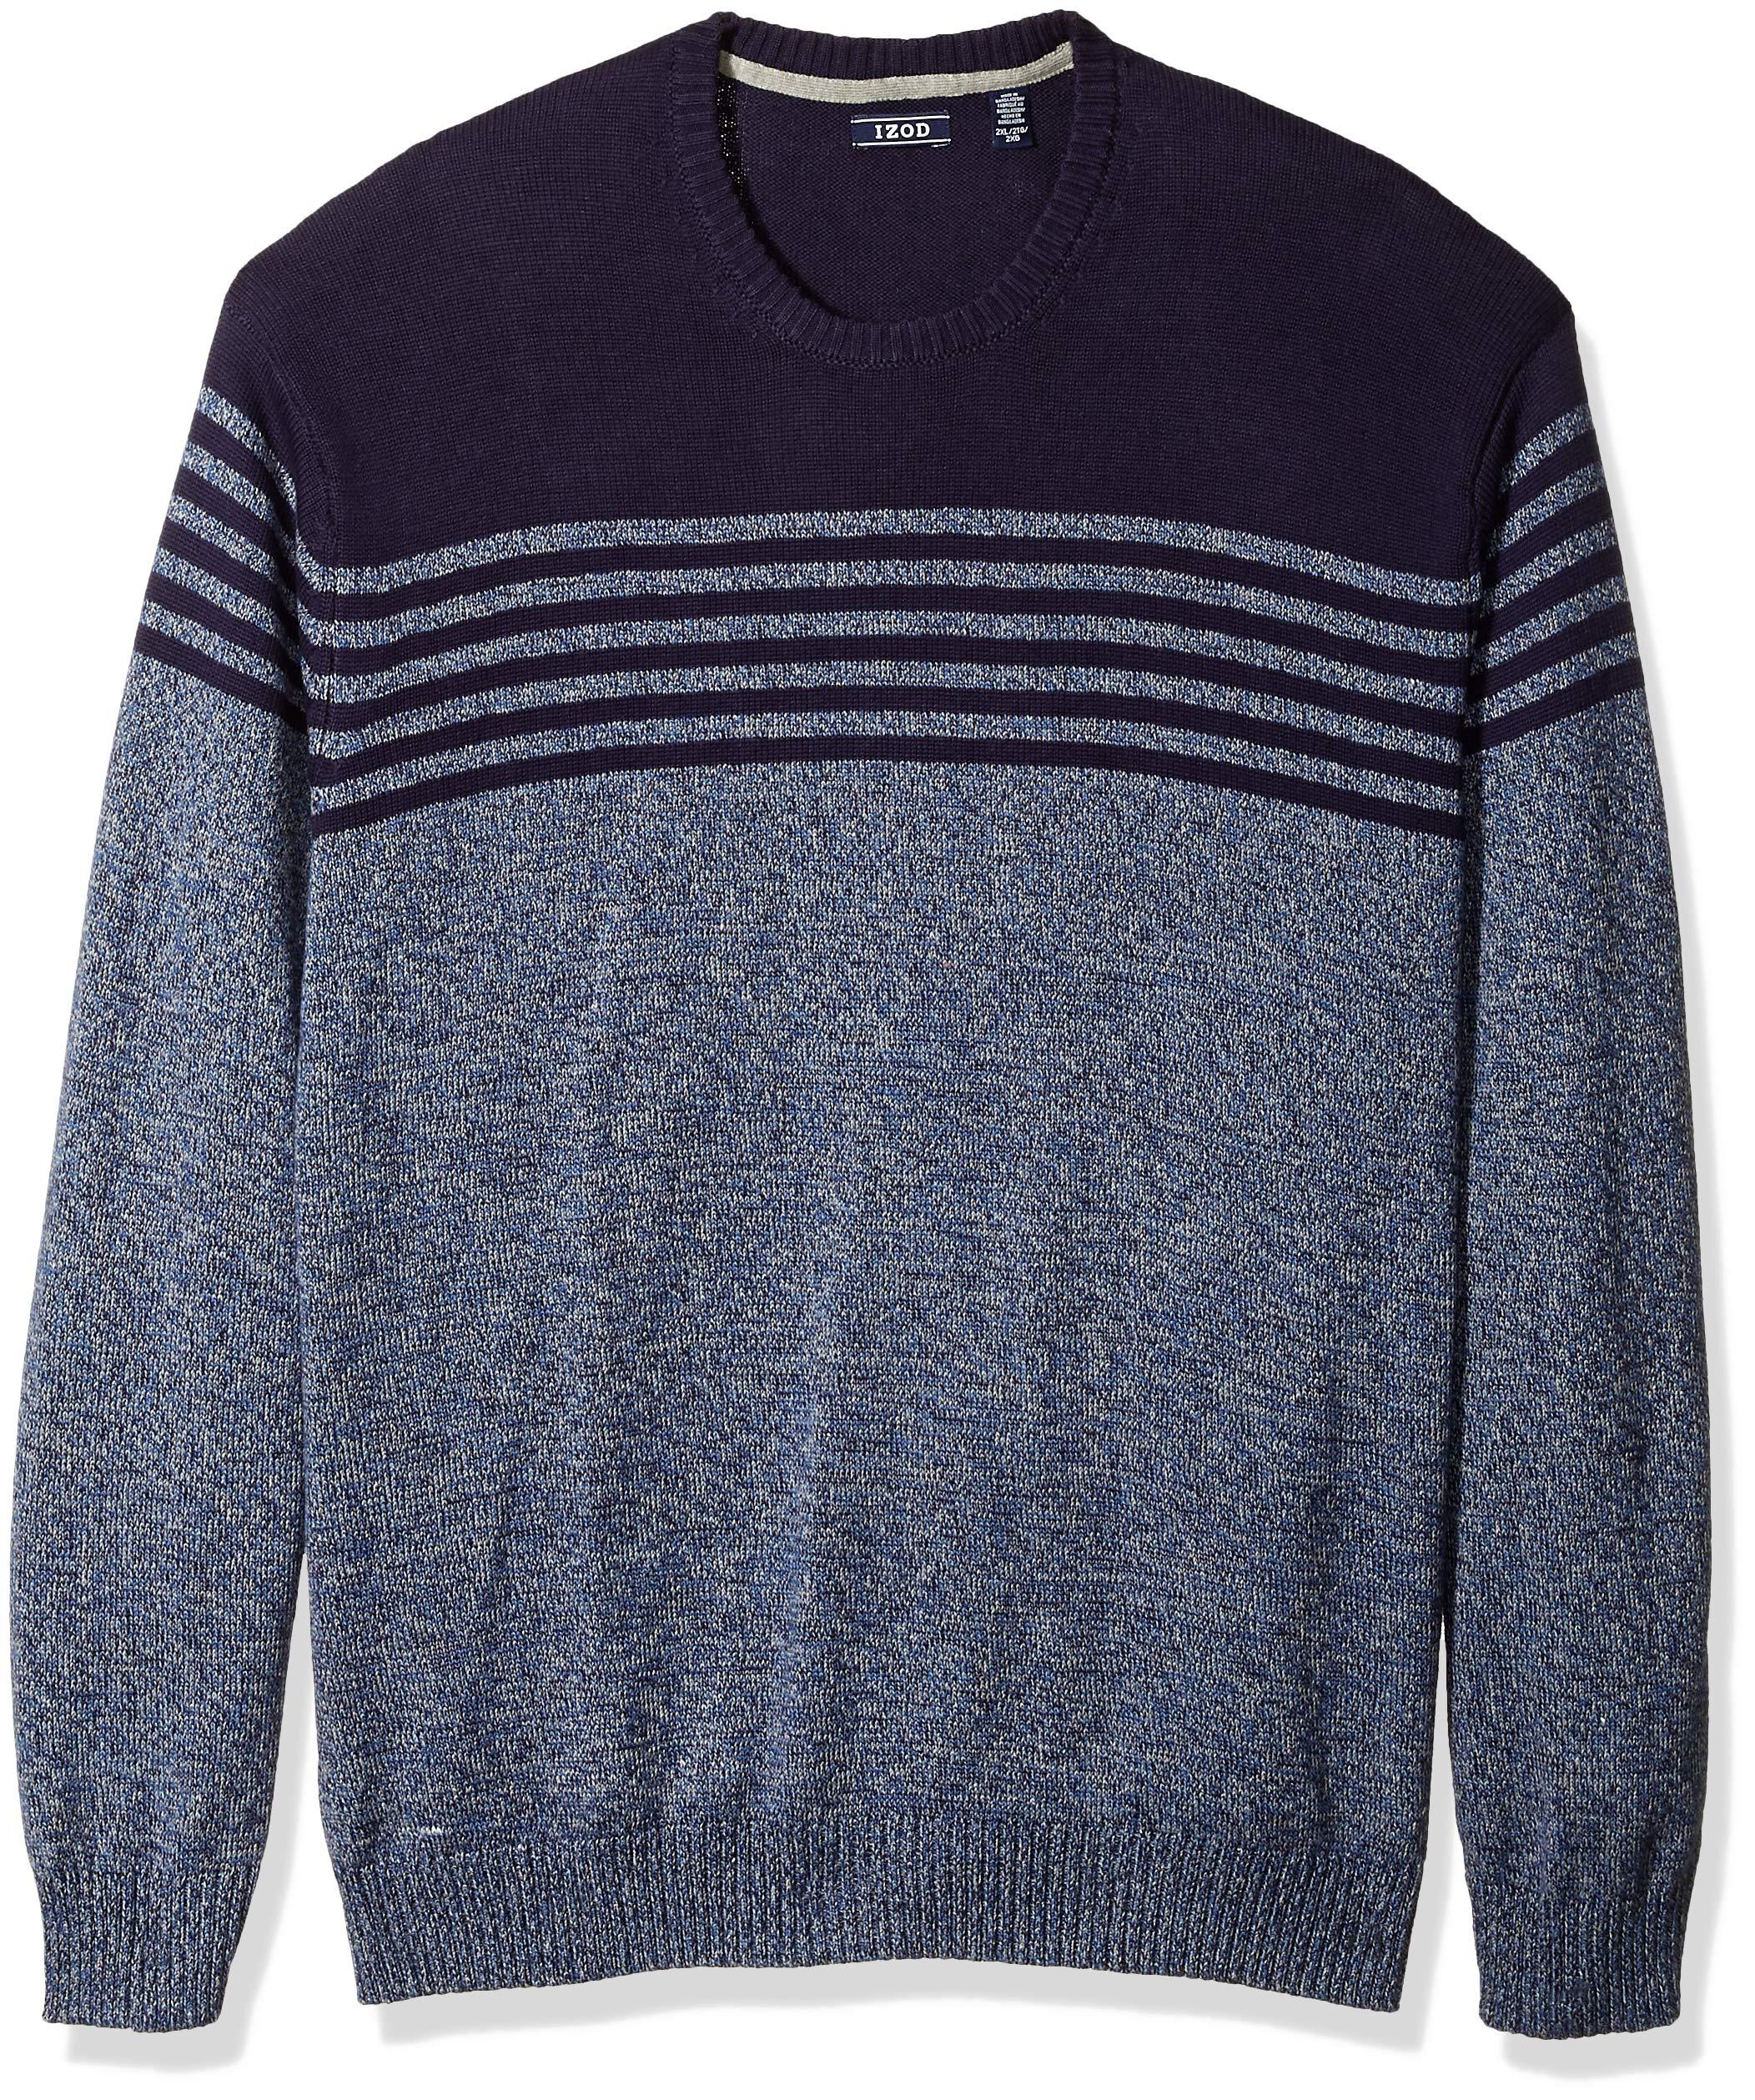 IZOD Men's Big and Tall Newport Stripe 7 Gauge Crewneck Sweater, Peacoat, 4X-Large